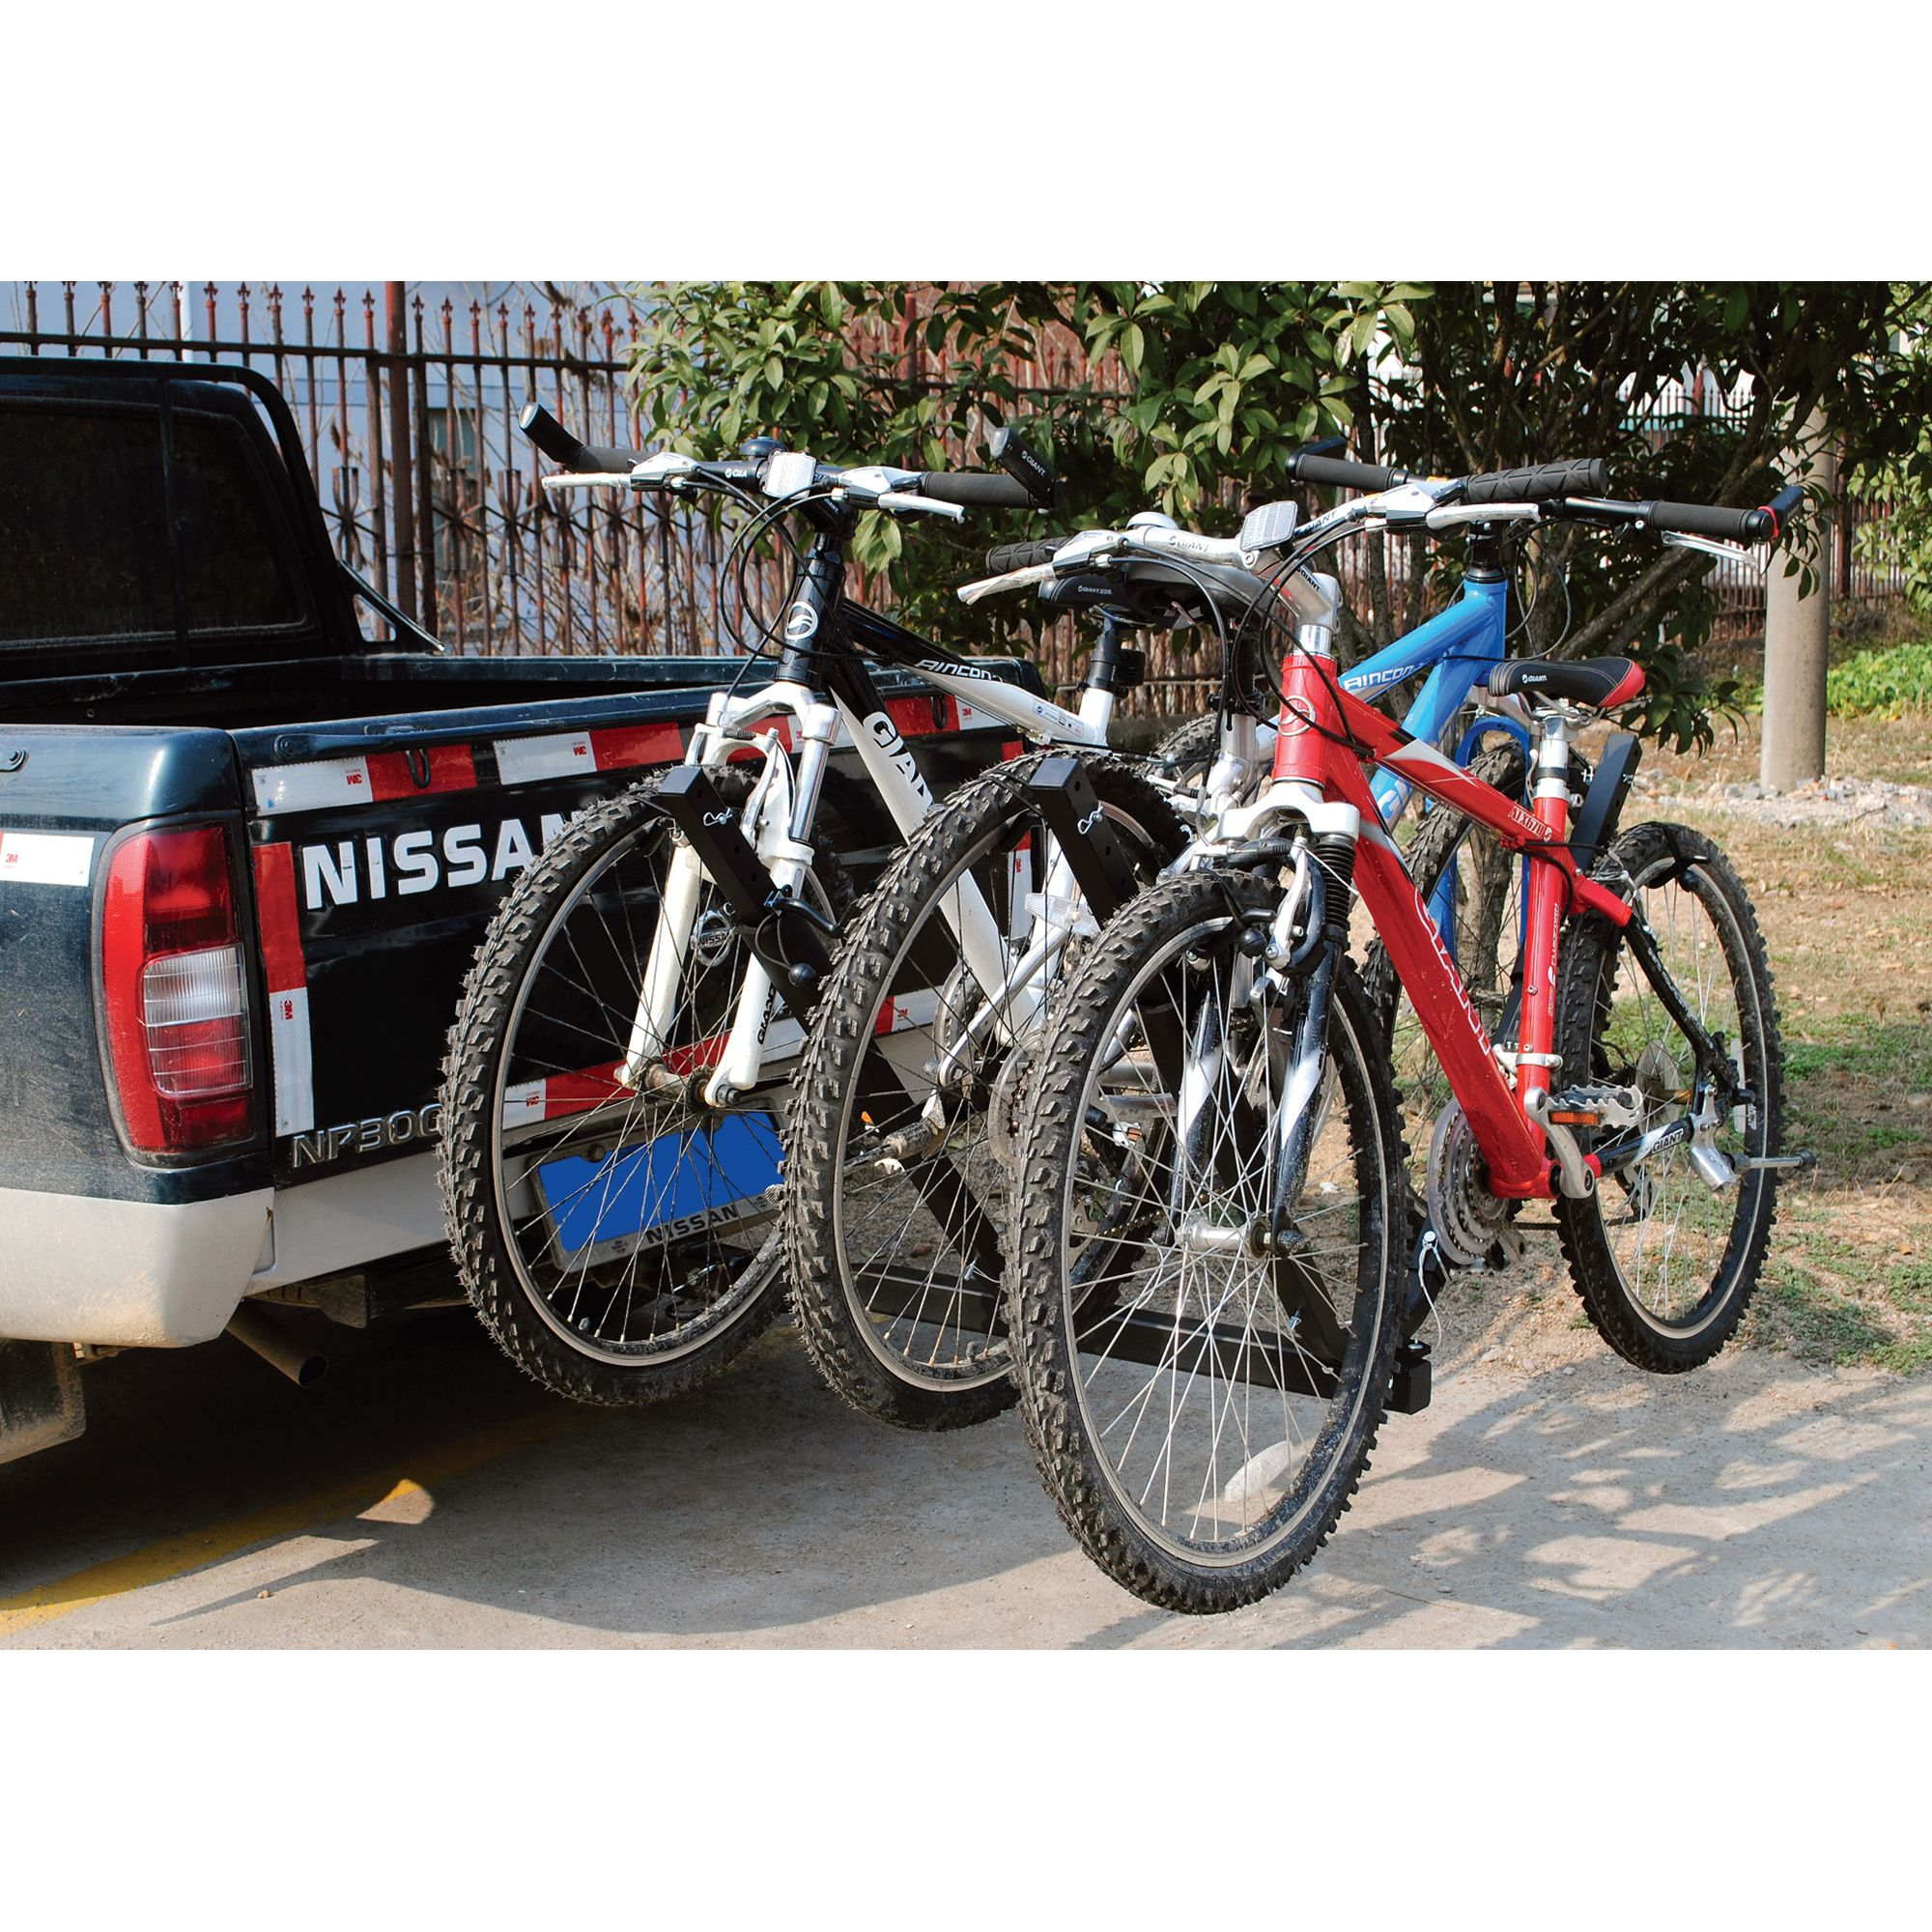 bike com outdoorplay malone trailer package main specs rack microsport